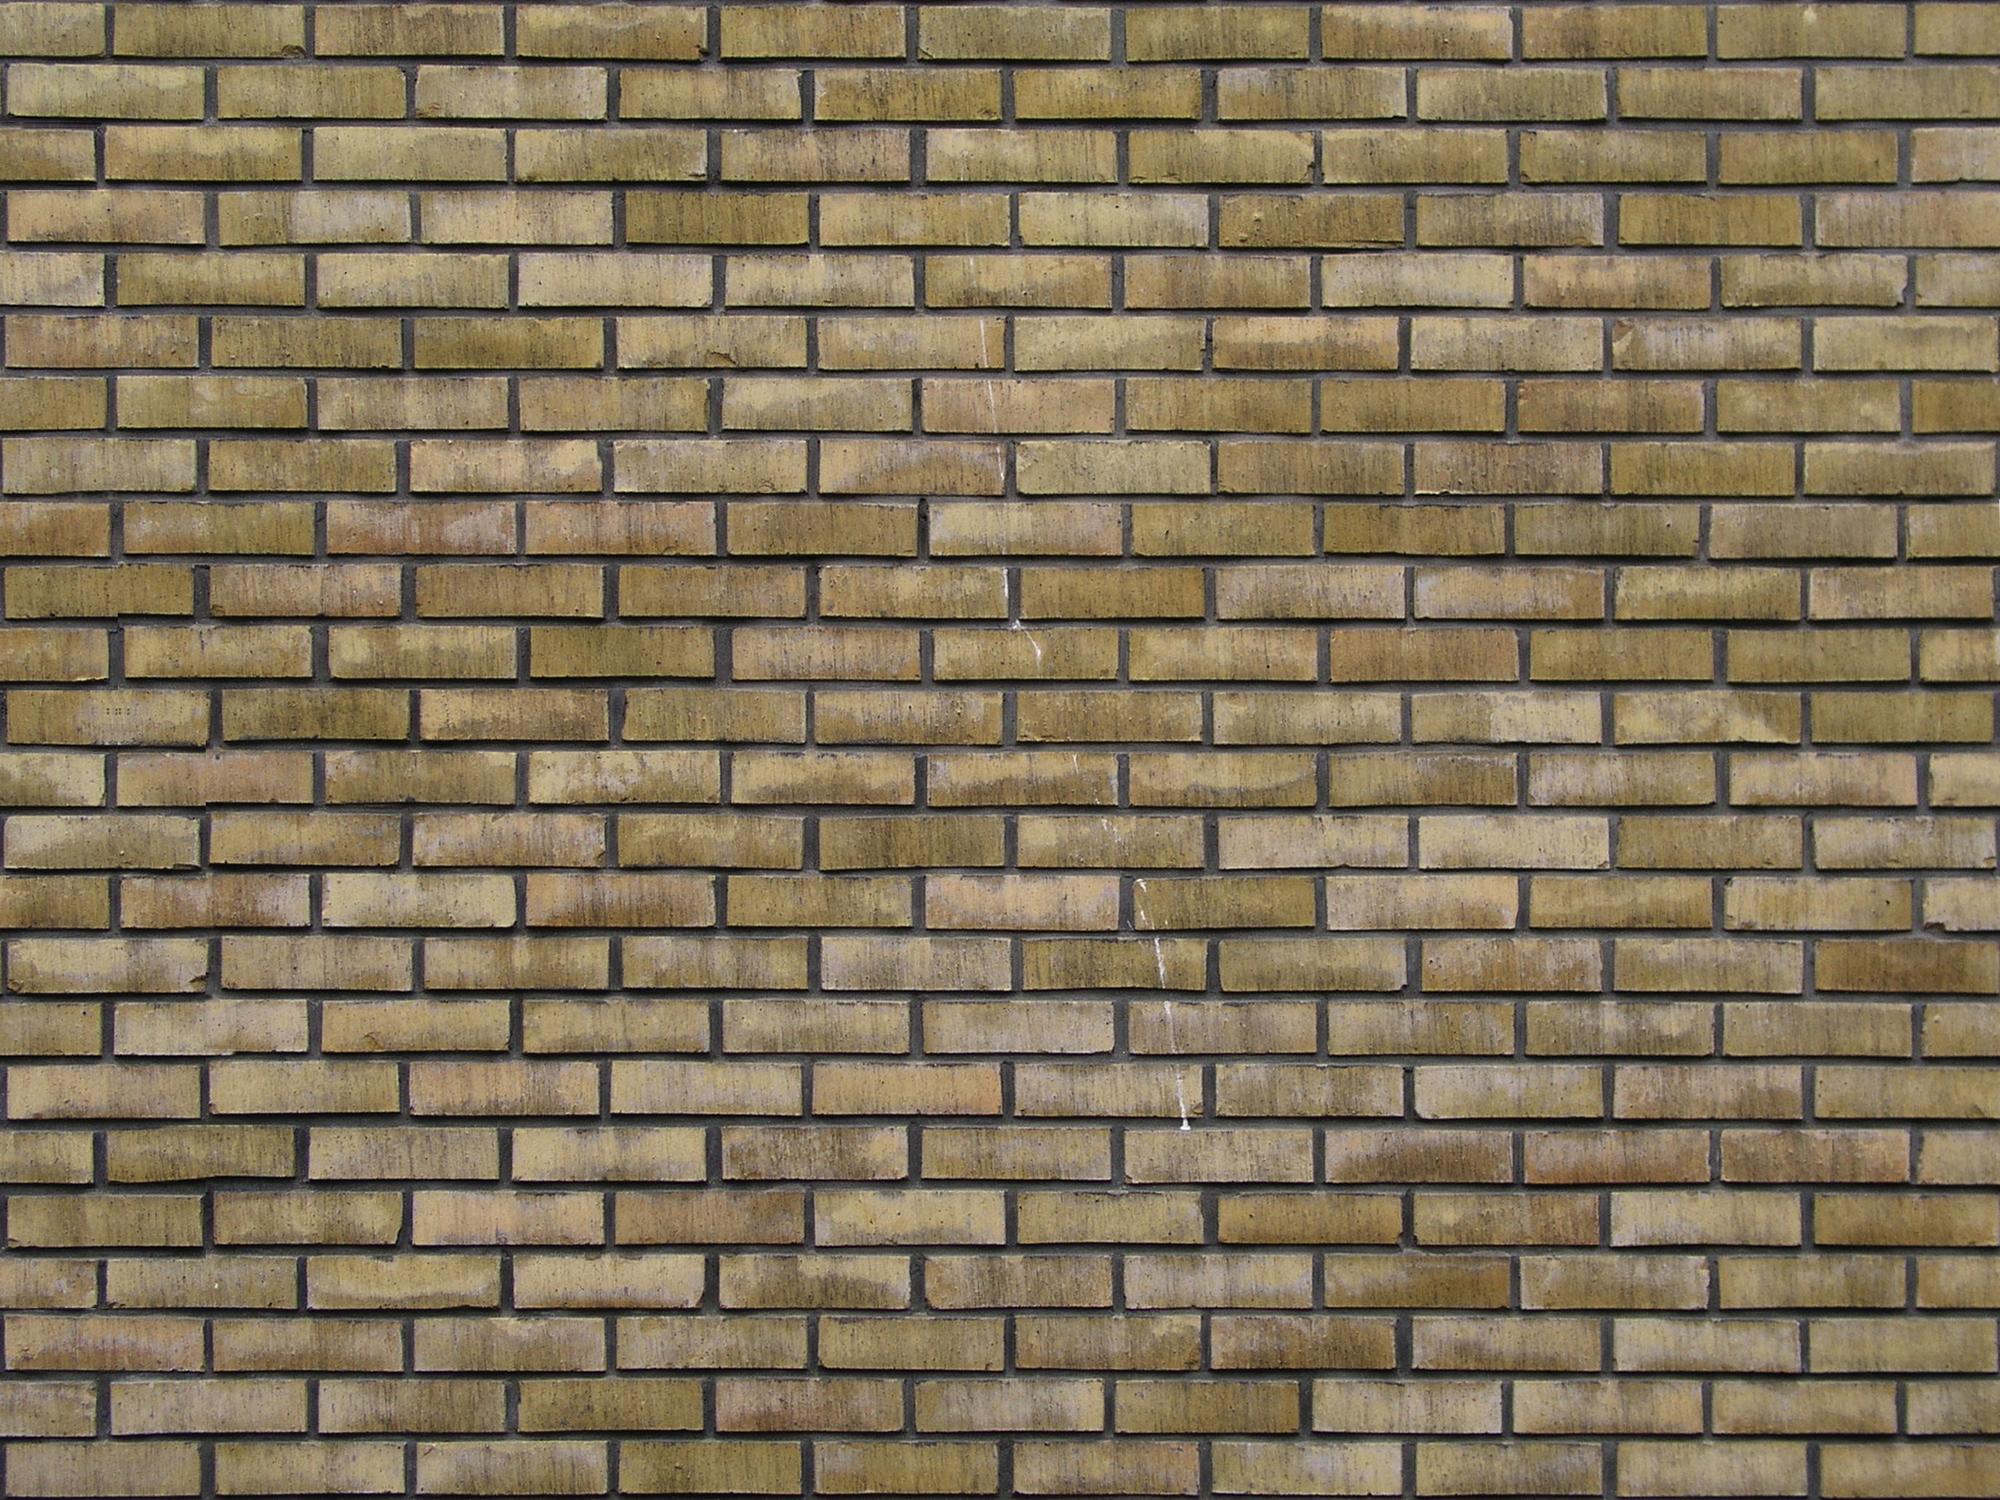 brick texture, текстура, кирпичей, фон, скачать фото